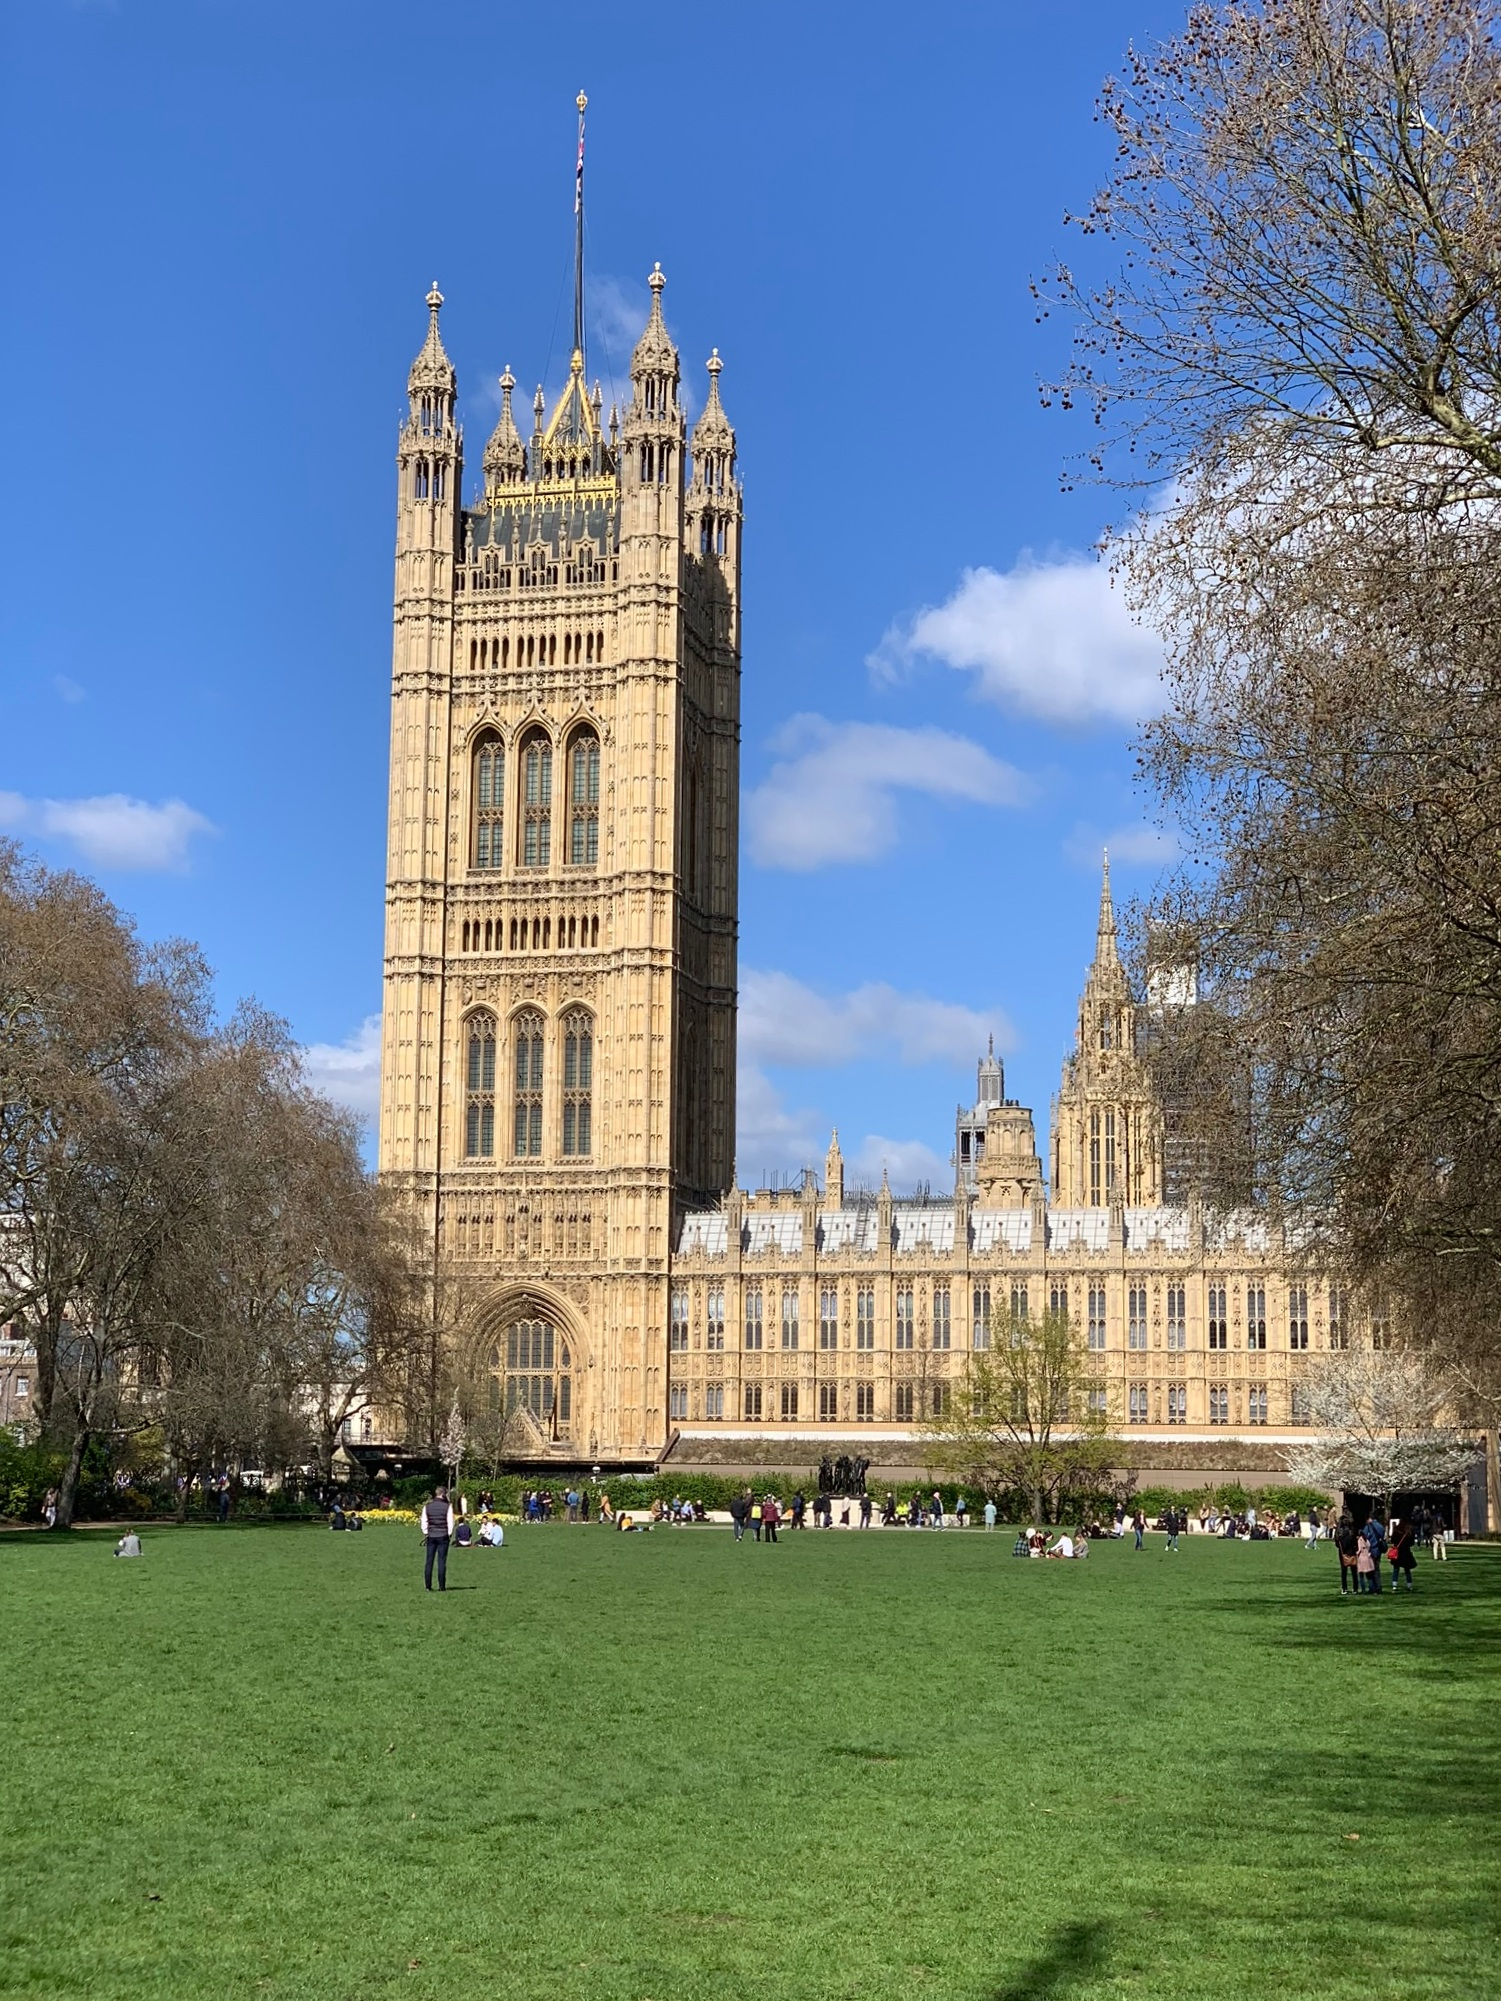 Victoria Tower